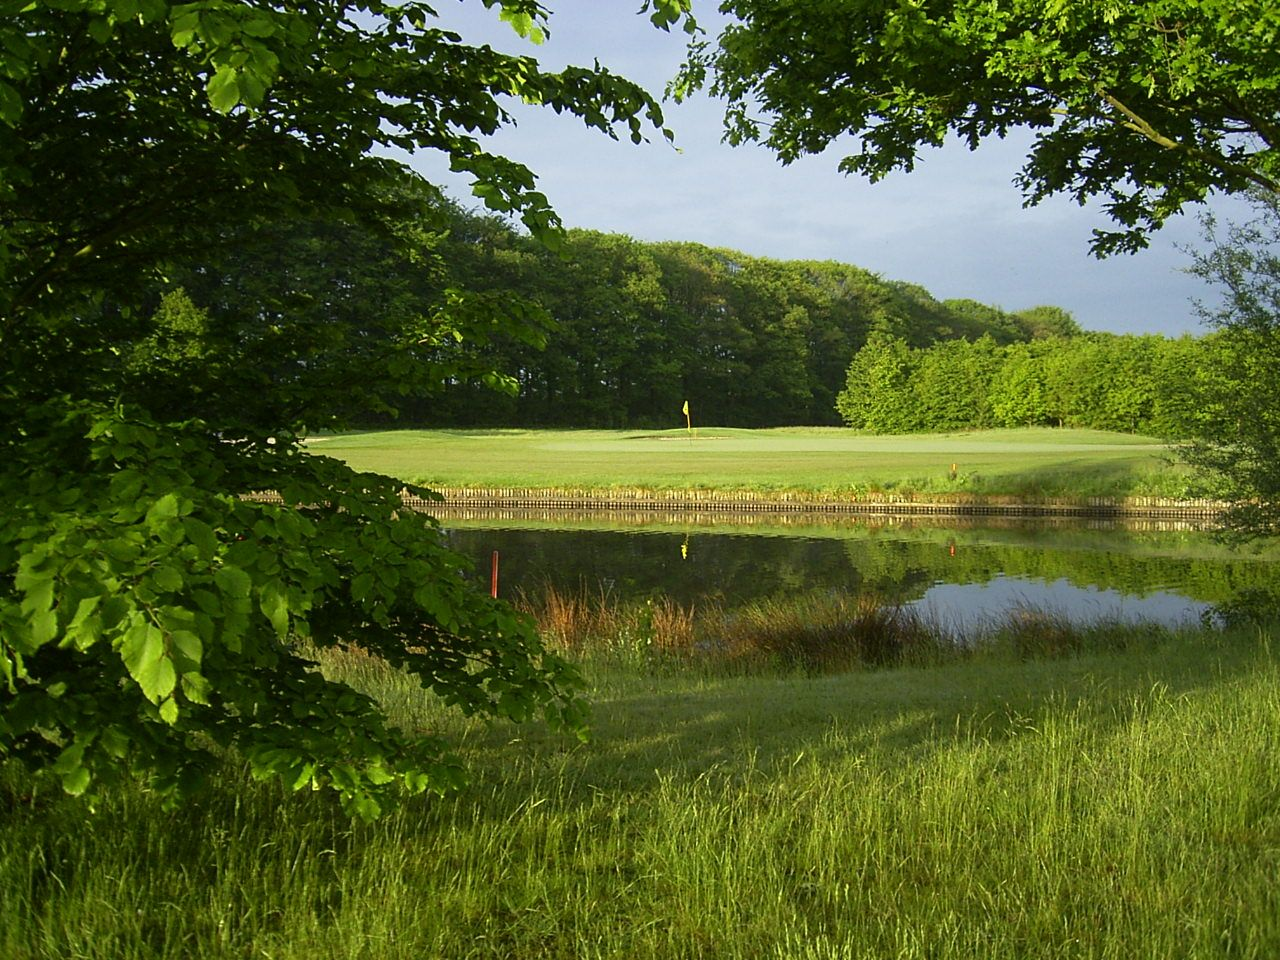 Open Oosterhoutse Golfkampioenschappen • Golf.nl Golf.nl